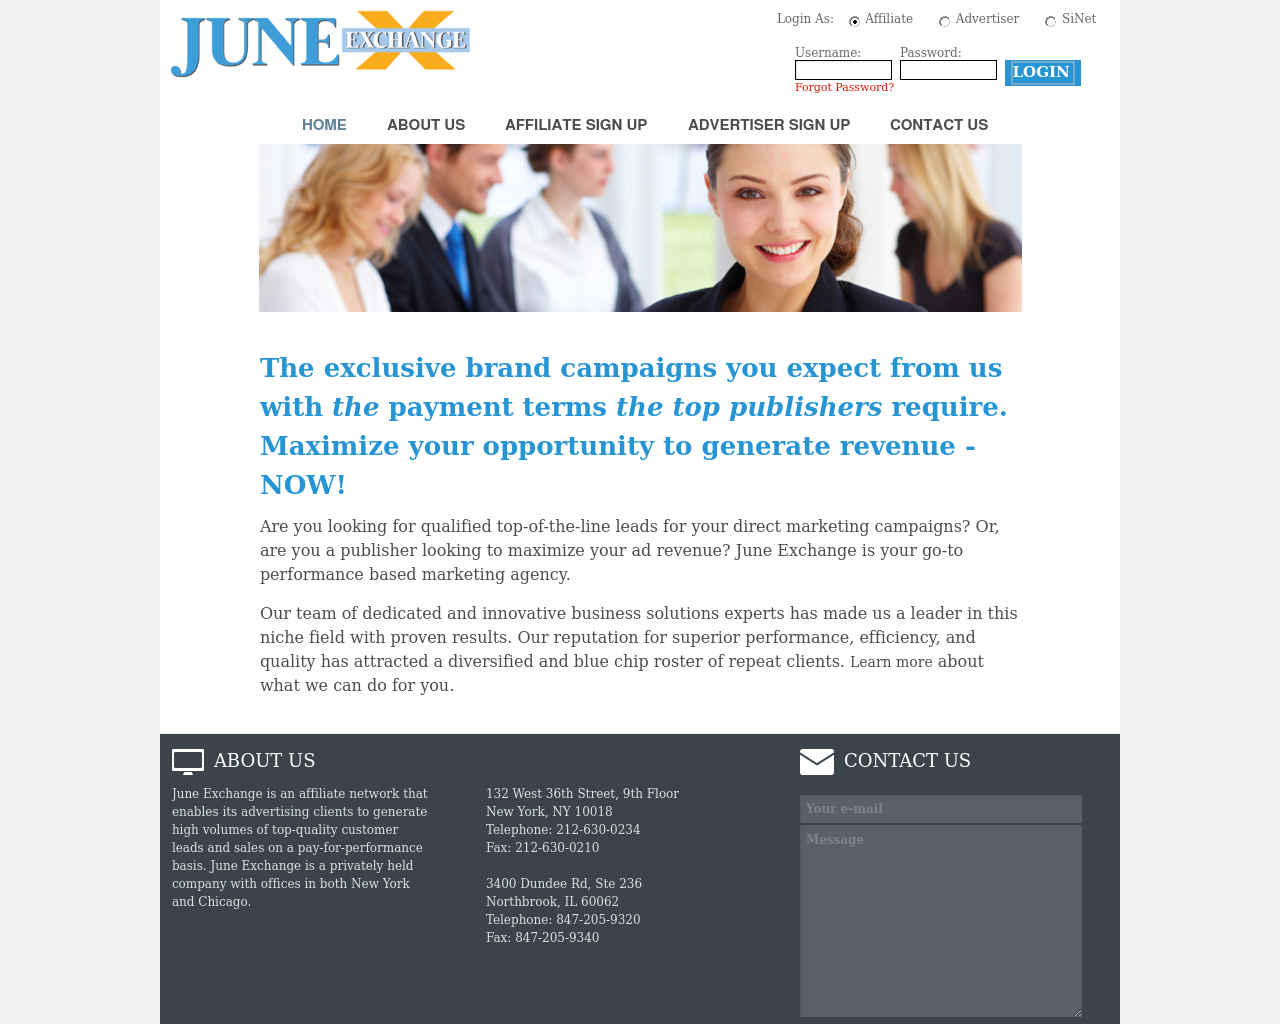 SilveriNet-/-June-Exchange-Advertising-Reviews-Pricing